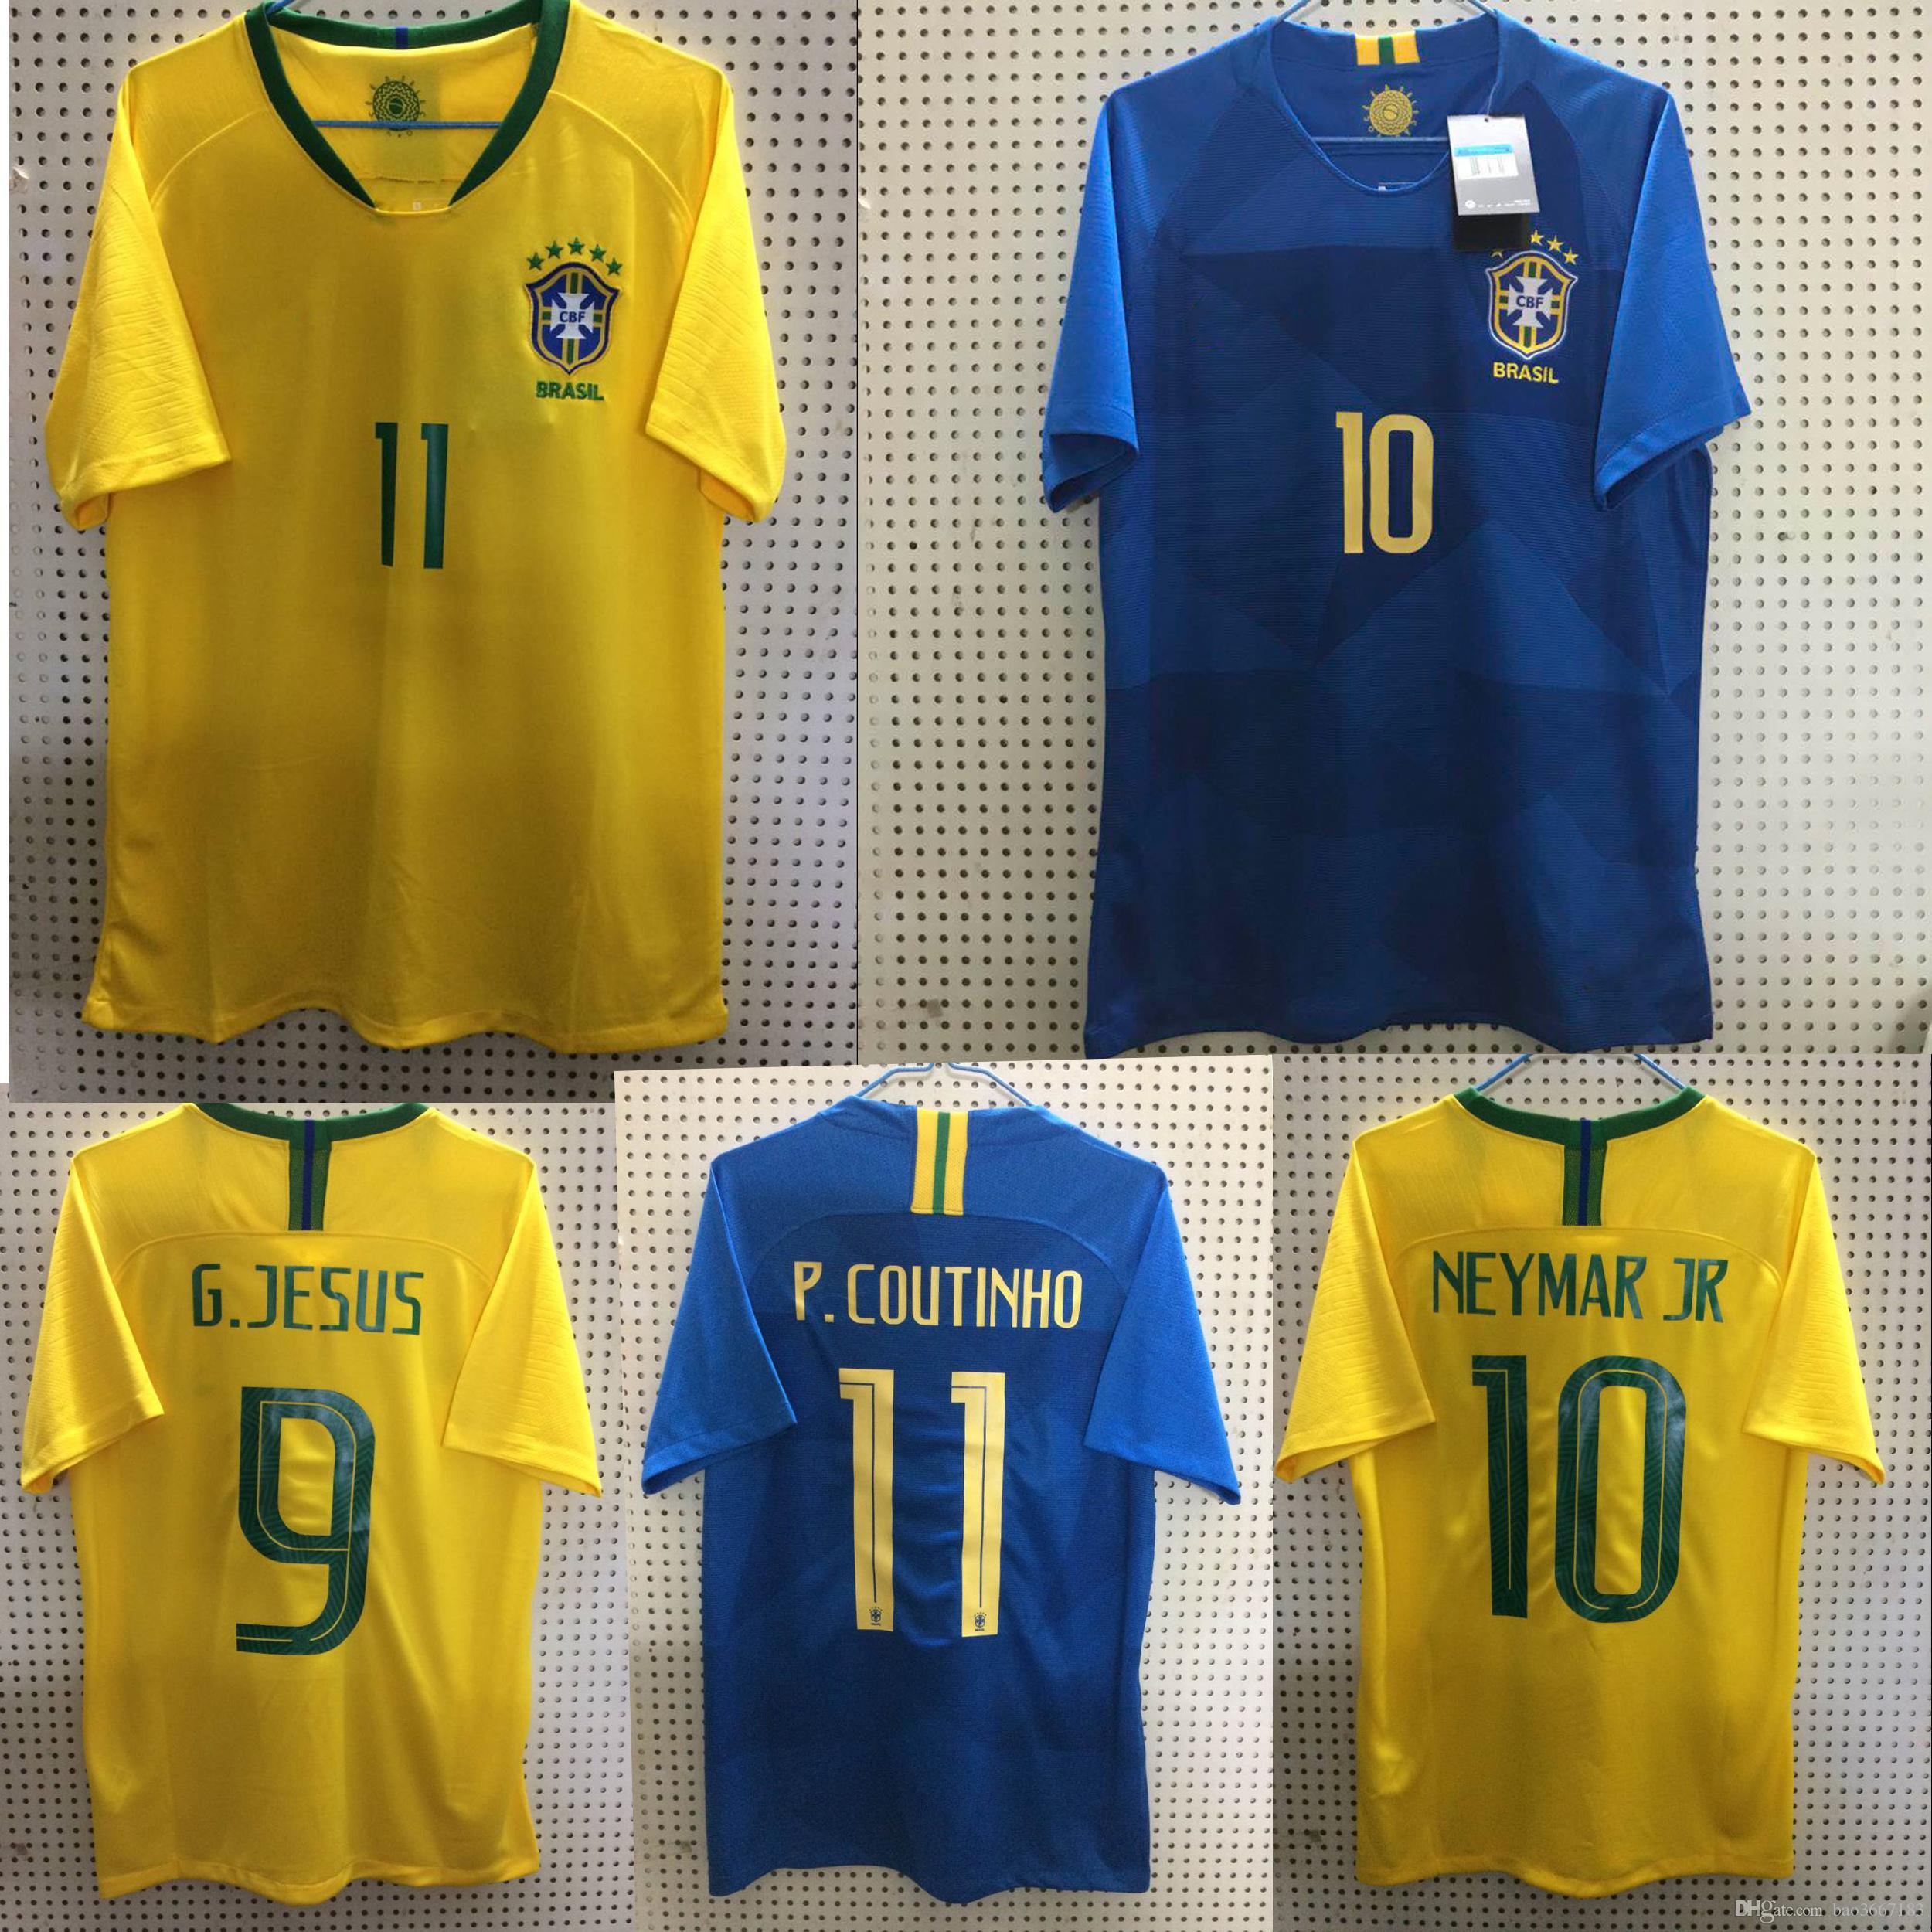 SIZE S-3XL 2018 World Cup Brazil Home Away Soccer Jerseys 2018 World Cup  Football Shirts NEYMAR JR COUTINHO G.JESUS Soccer Jerseys 2017 2018 Brazil  Soccer ...